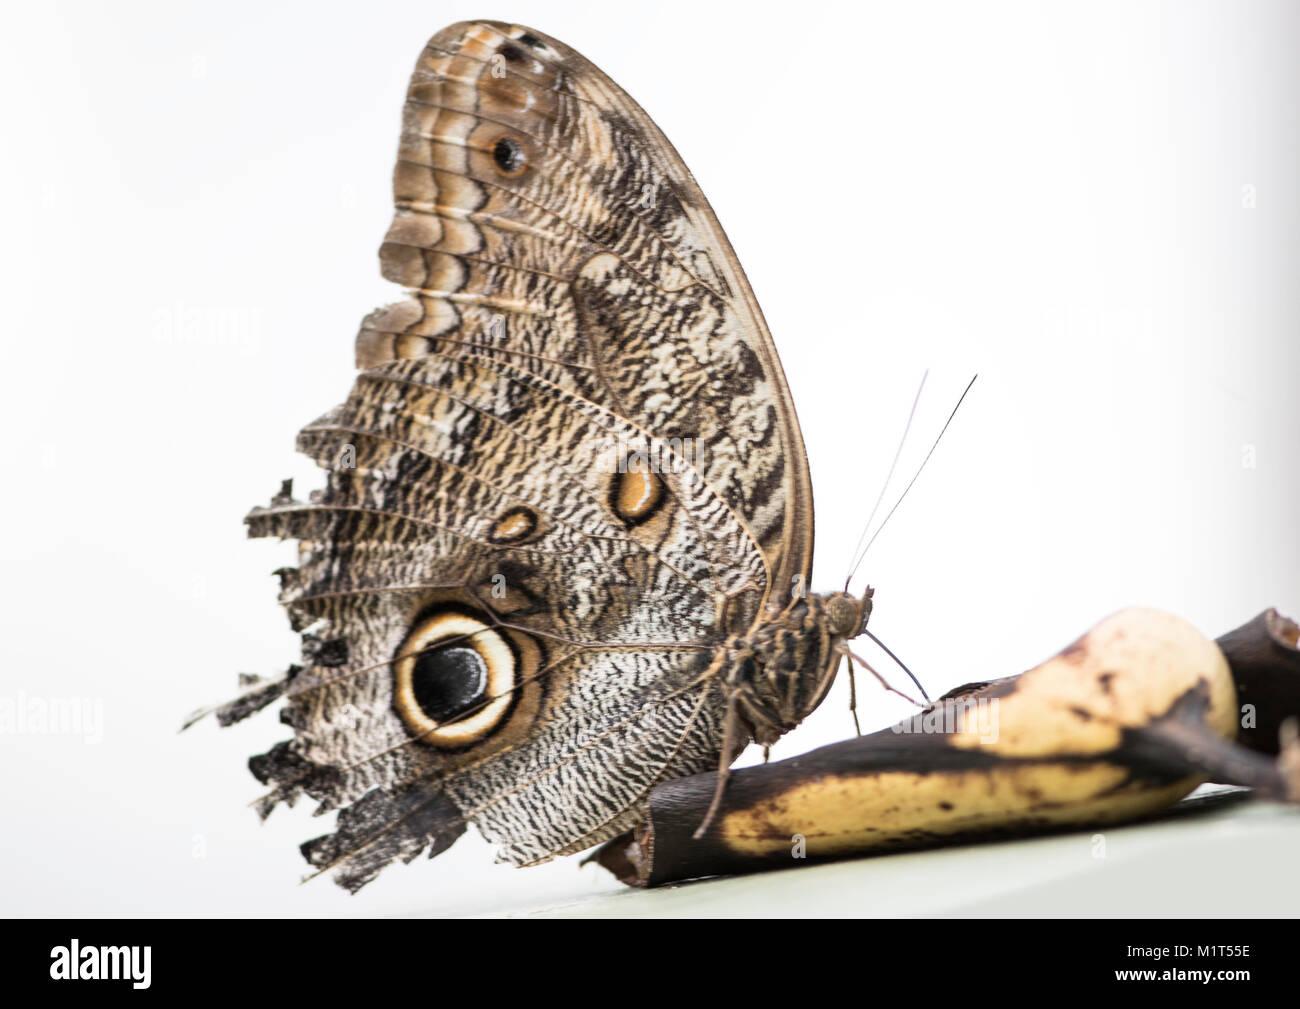 owl butterfly (Caligo eurilochus) eats from a banana.  Seen against a plain background - Stock Image